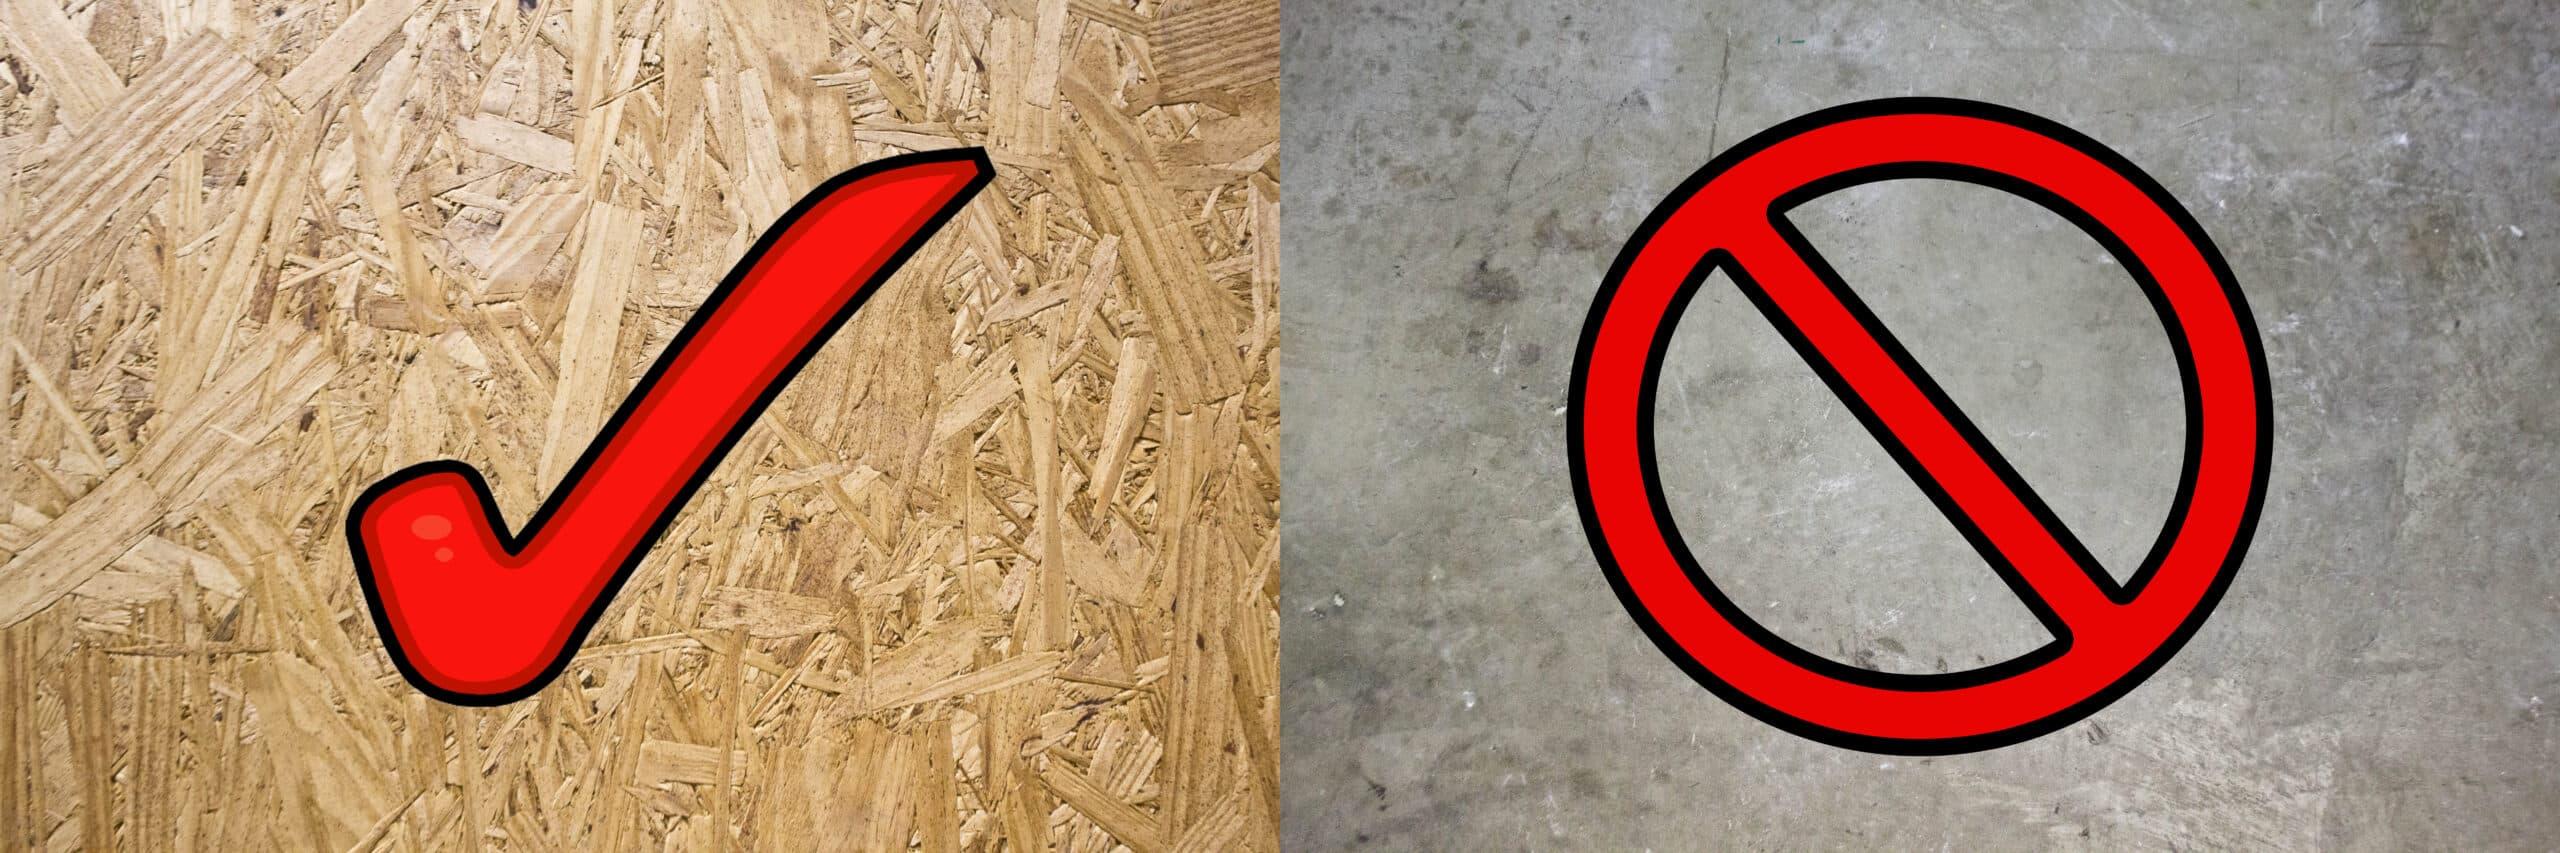 Standars Underlayment is suitable for wood subfloor installation